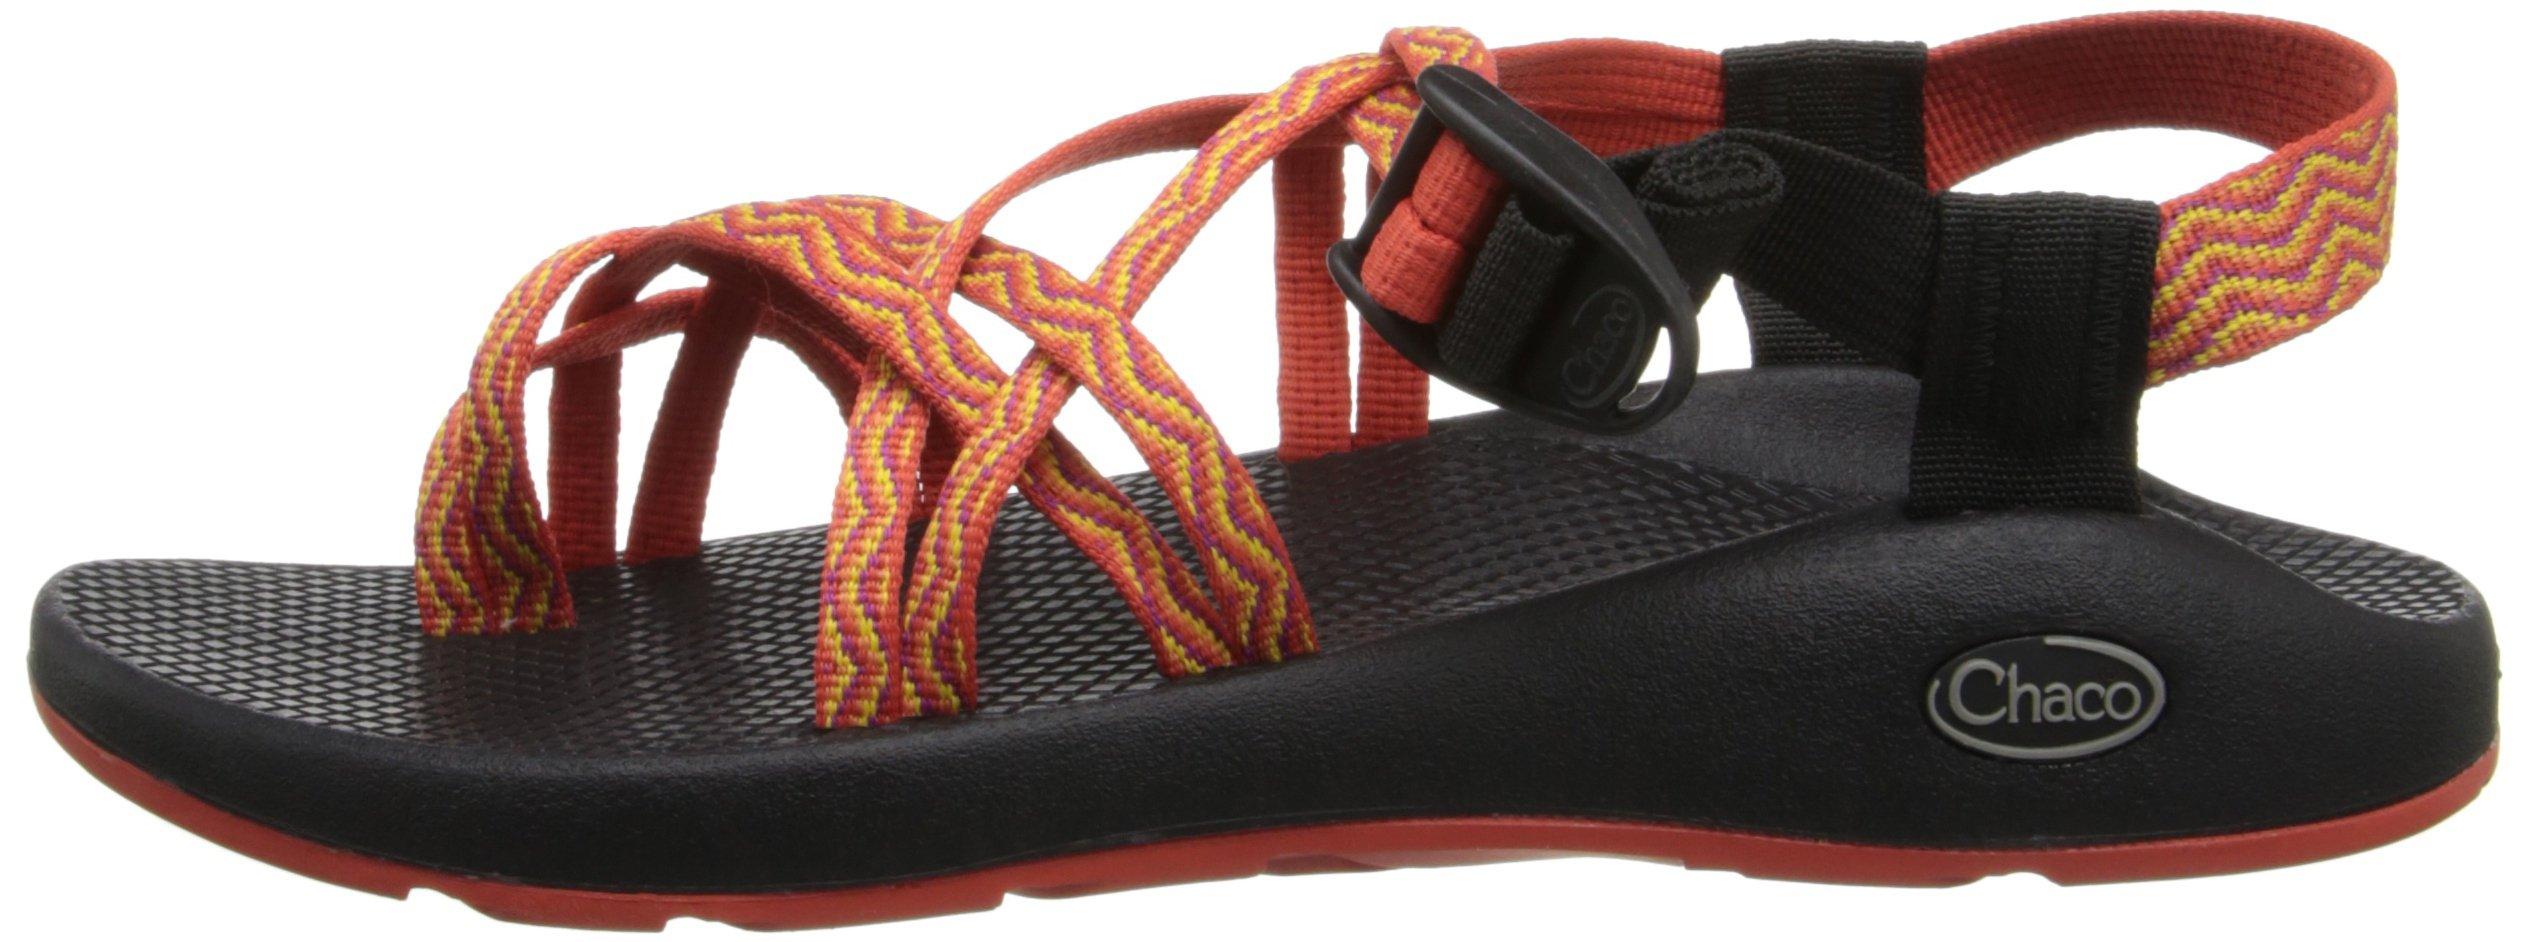 Chaco Women's ZX/2 Yampa Sandal,Rainbow,6 B US by Chaco (Image #5)